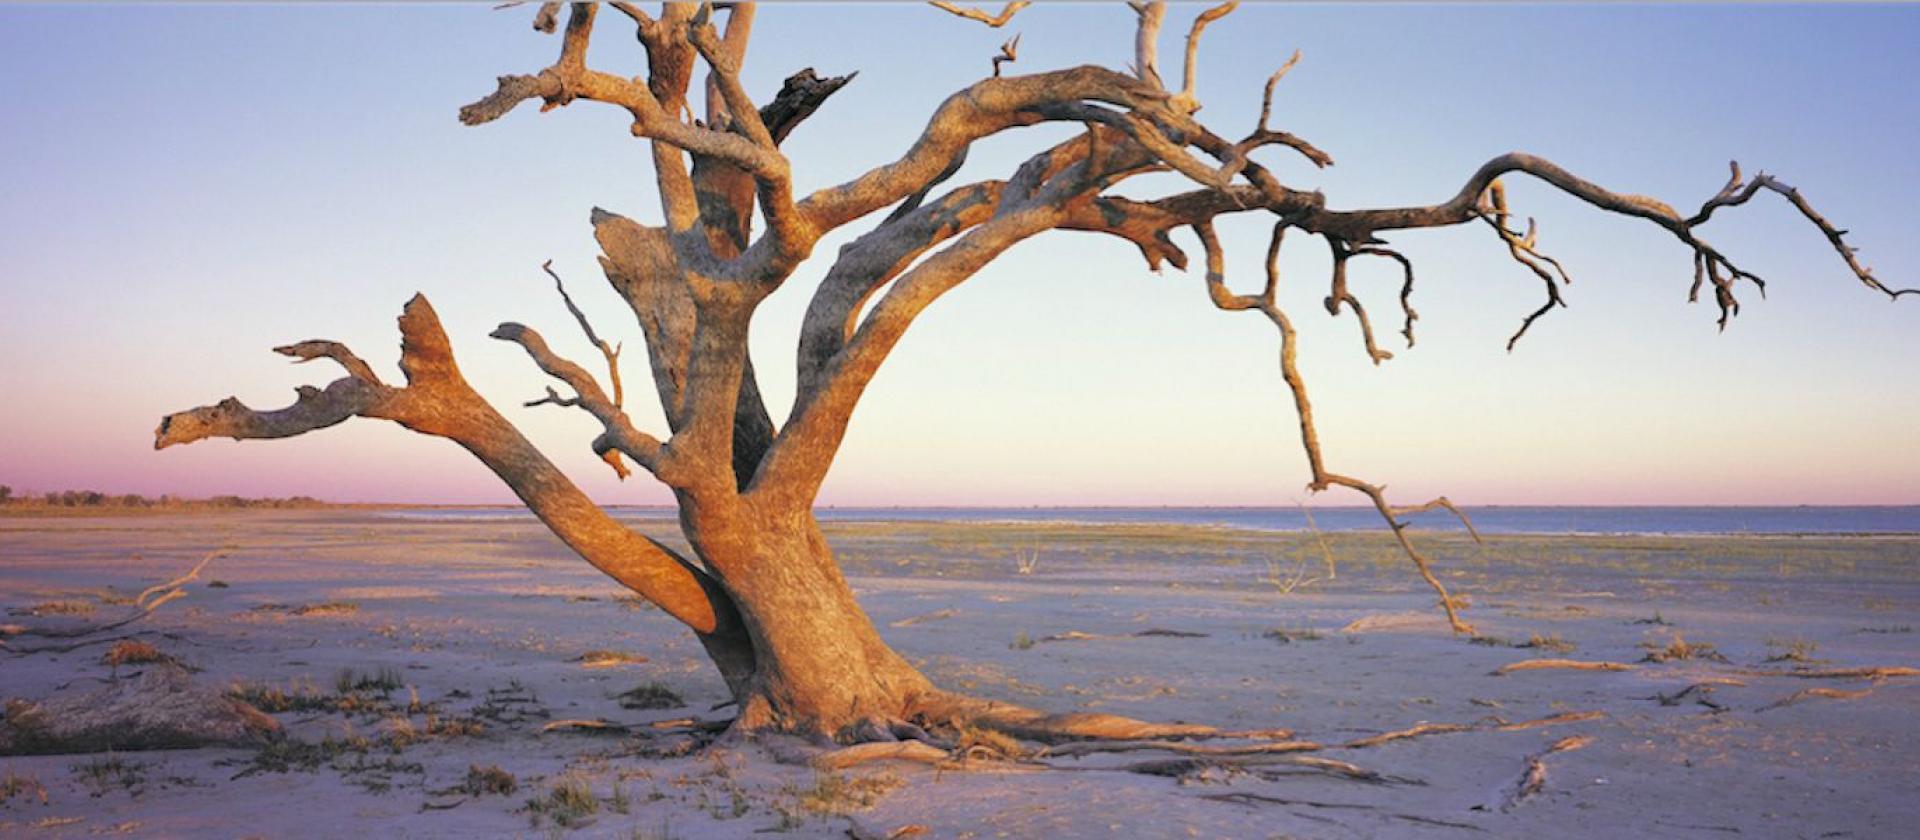 Twisted Tree, Menindee Lakes near Broken Hill